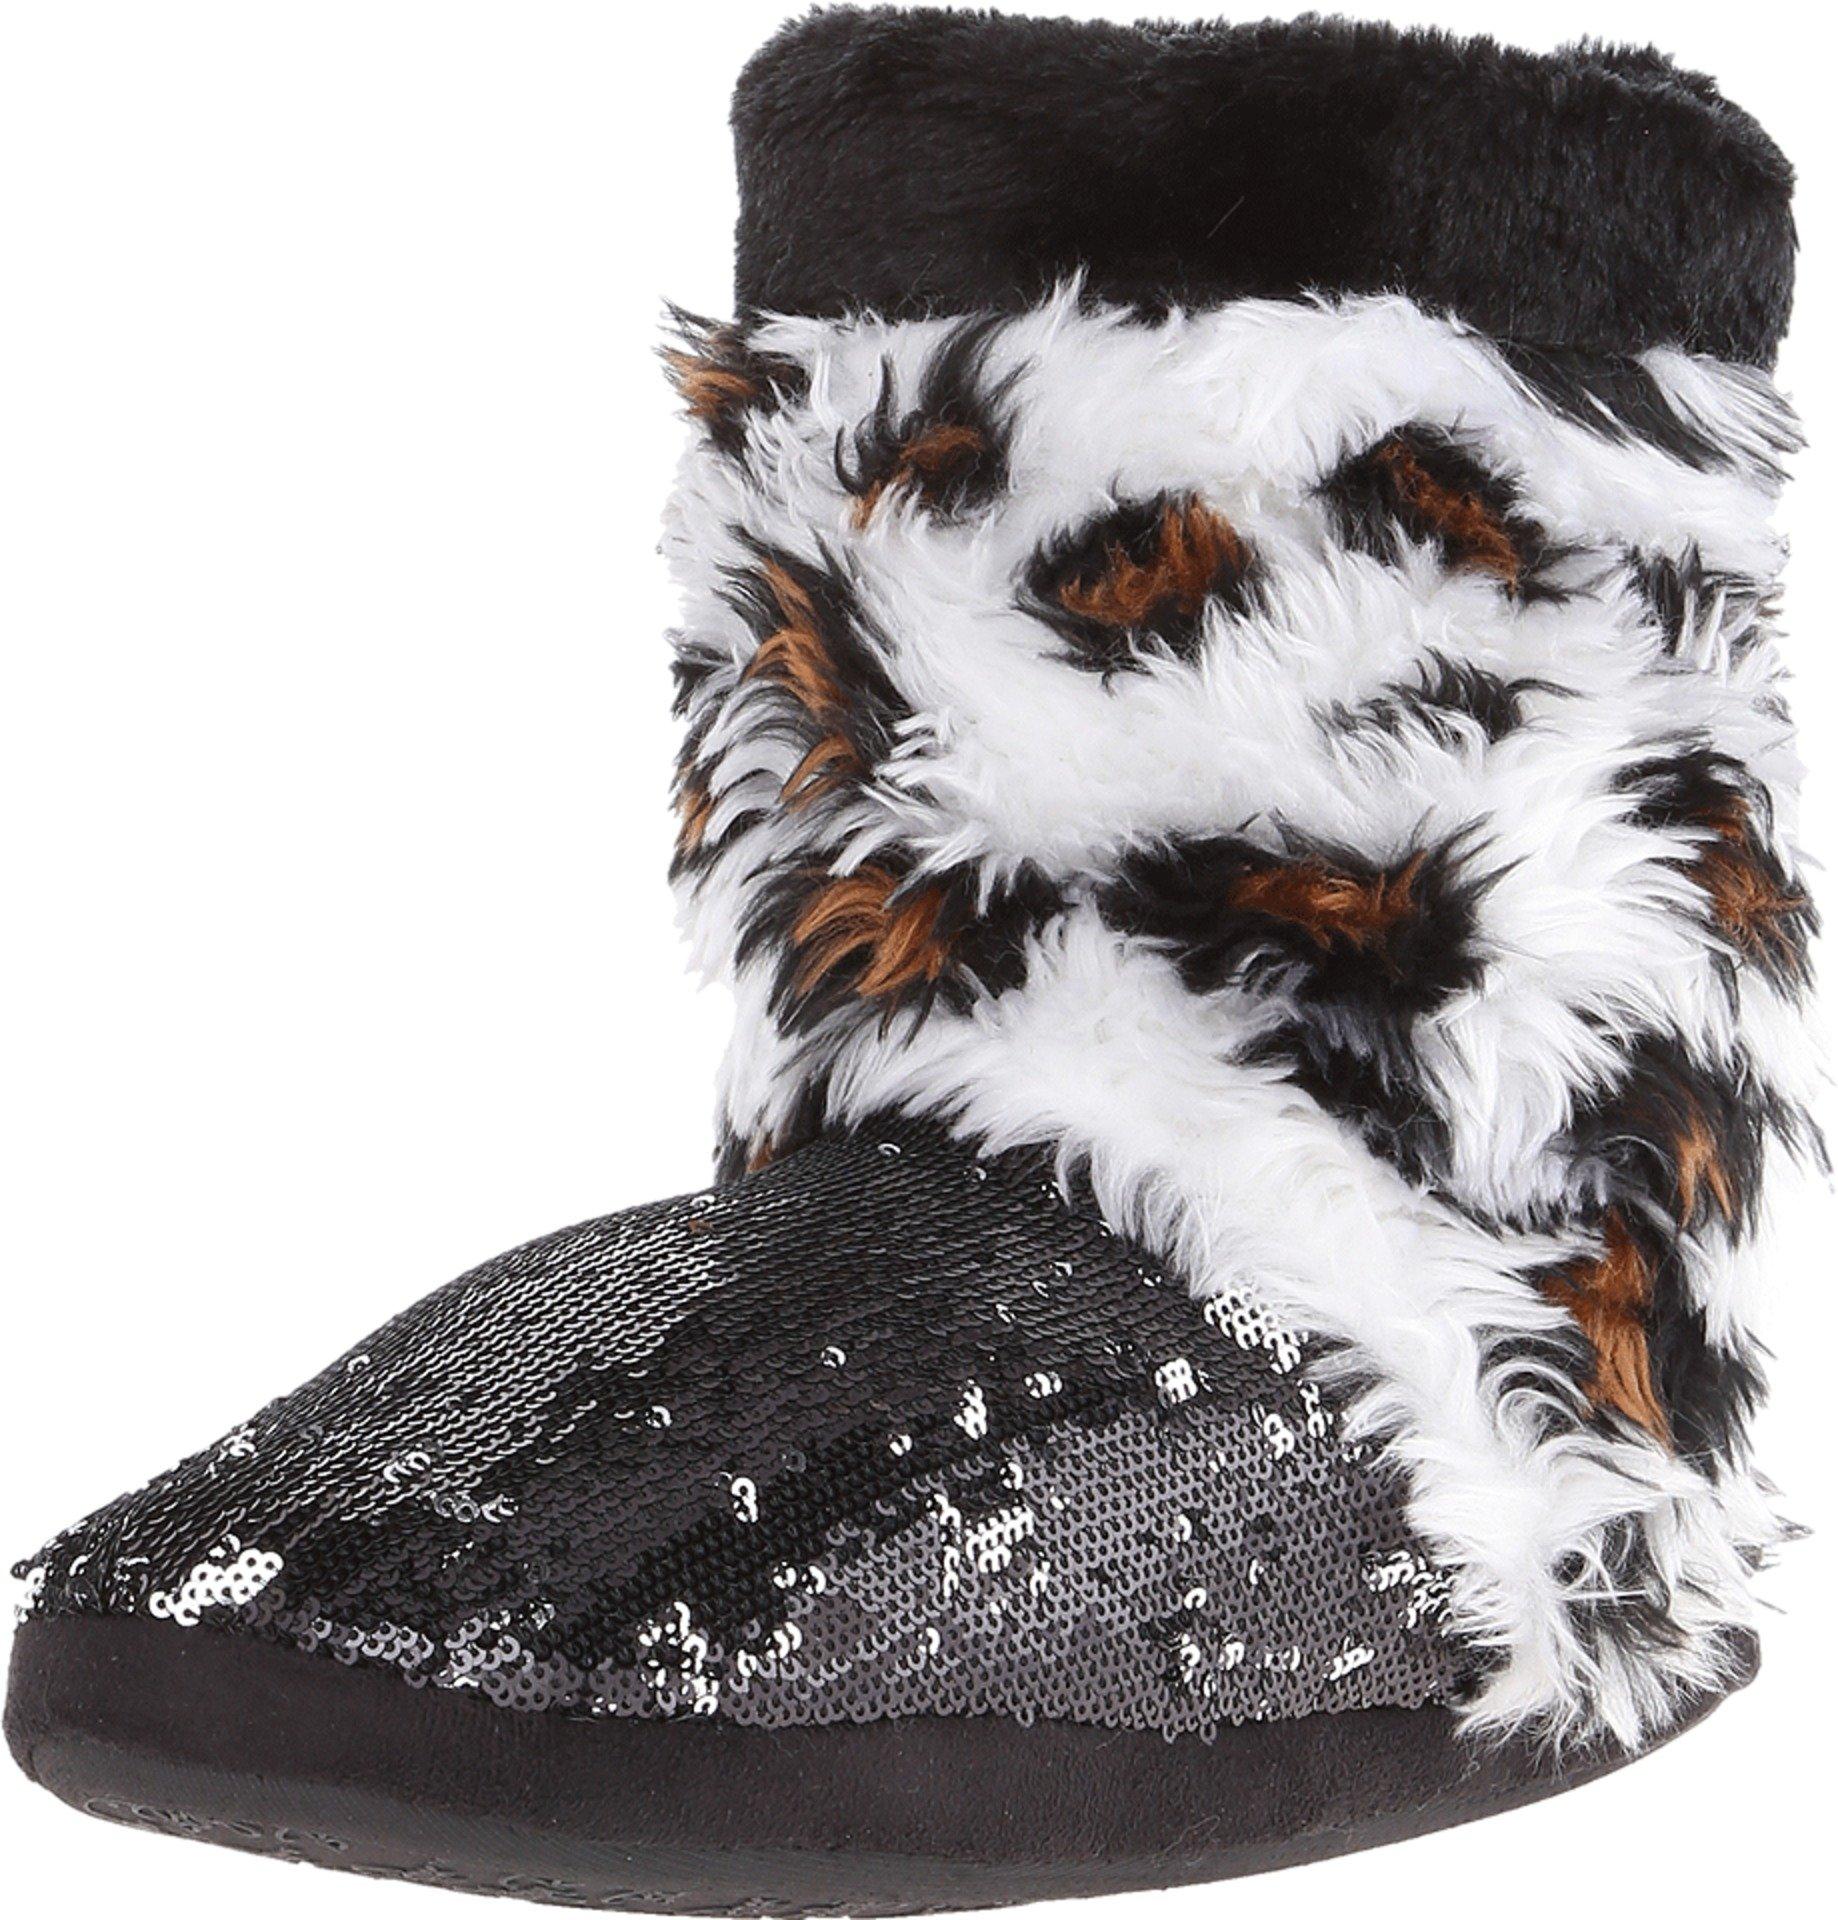 Blazin Roxx Women's Sequin Leopard Boot Slippers, Black Faux Fur, XL